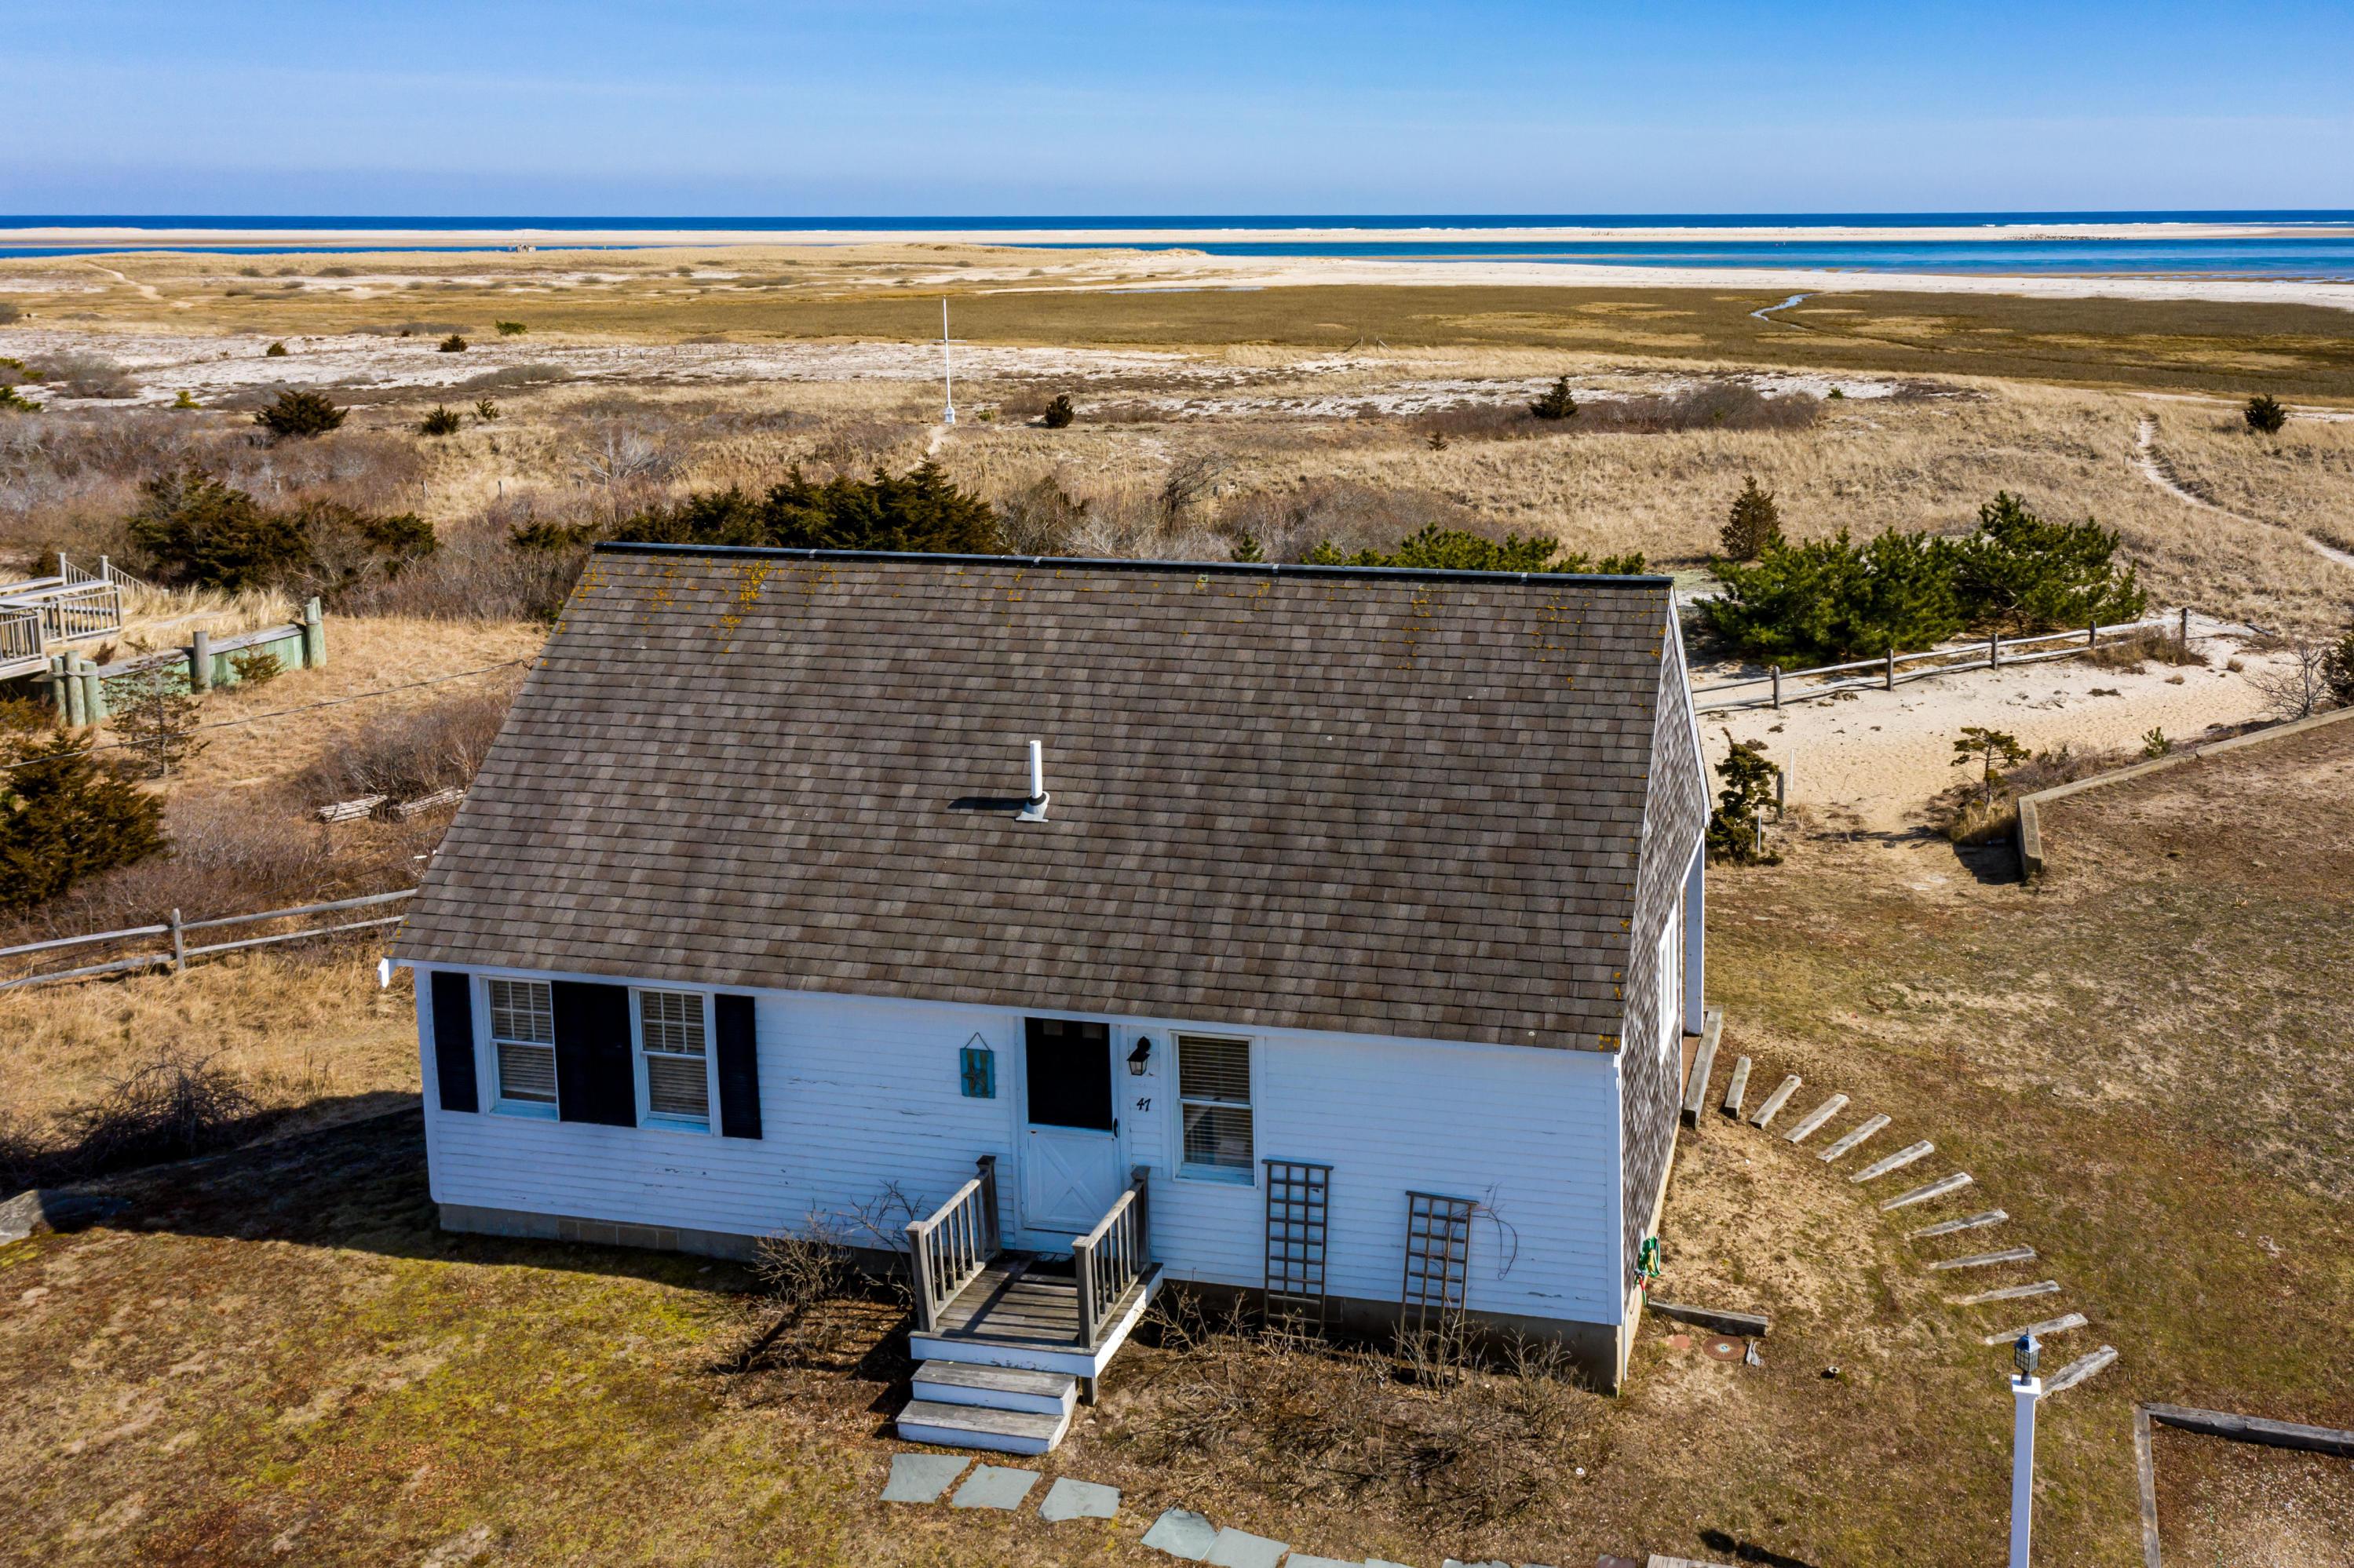 47 Little Beach Road, Chatham MA, 02633 sales details